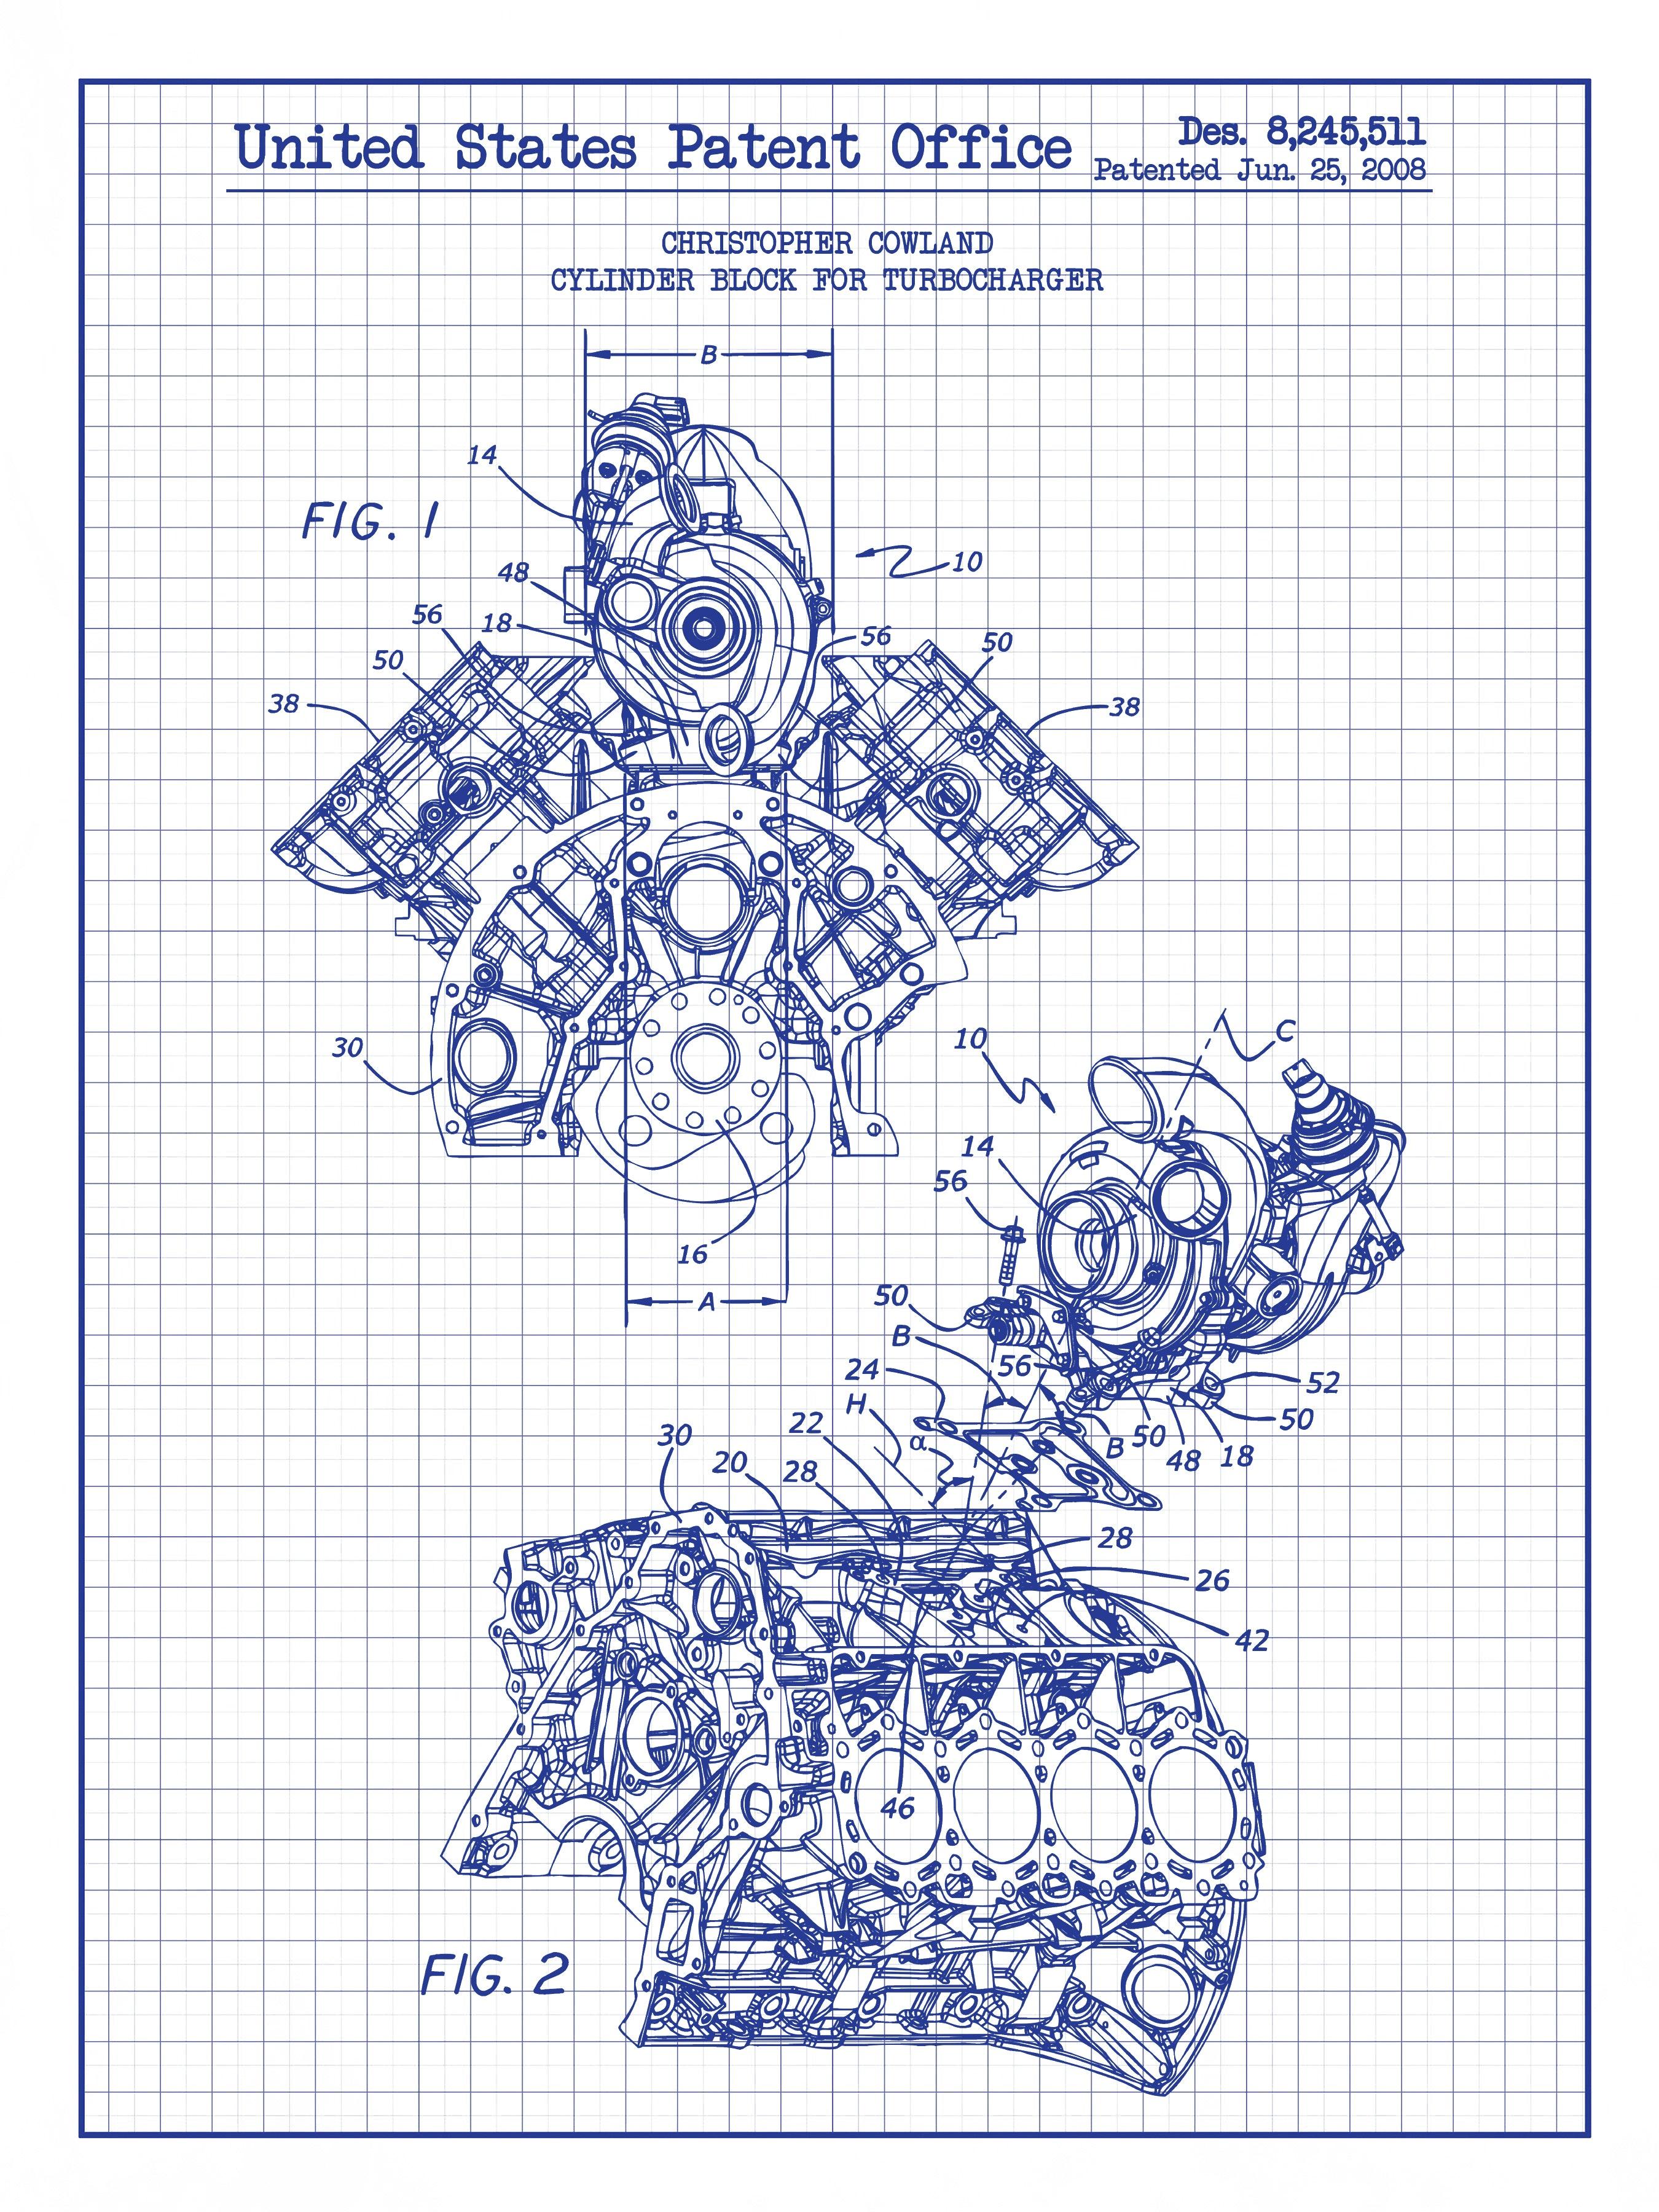 Cylinder Block for Turbocharger